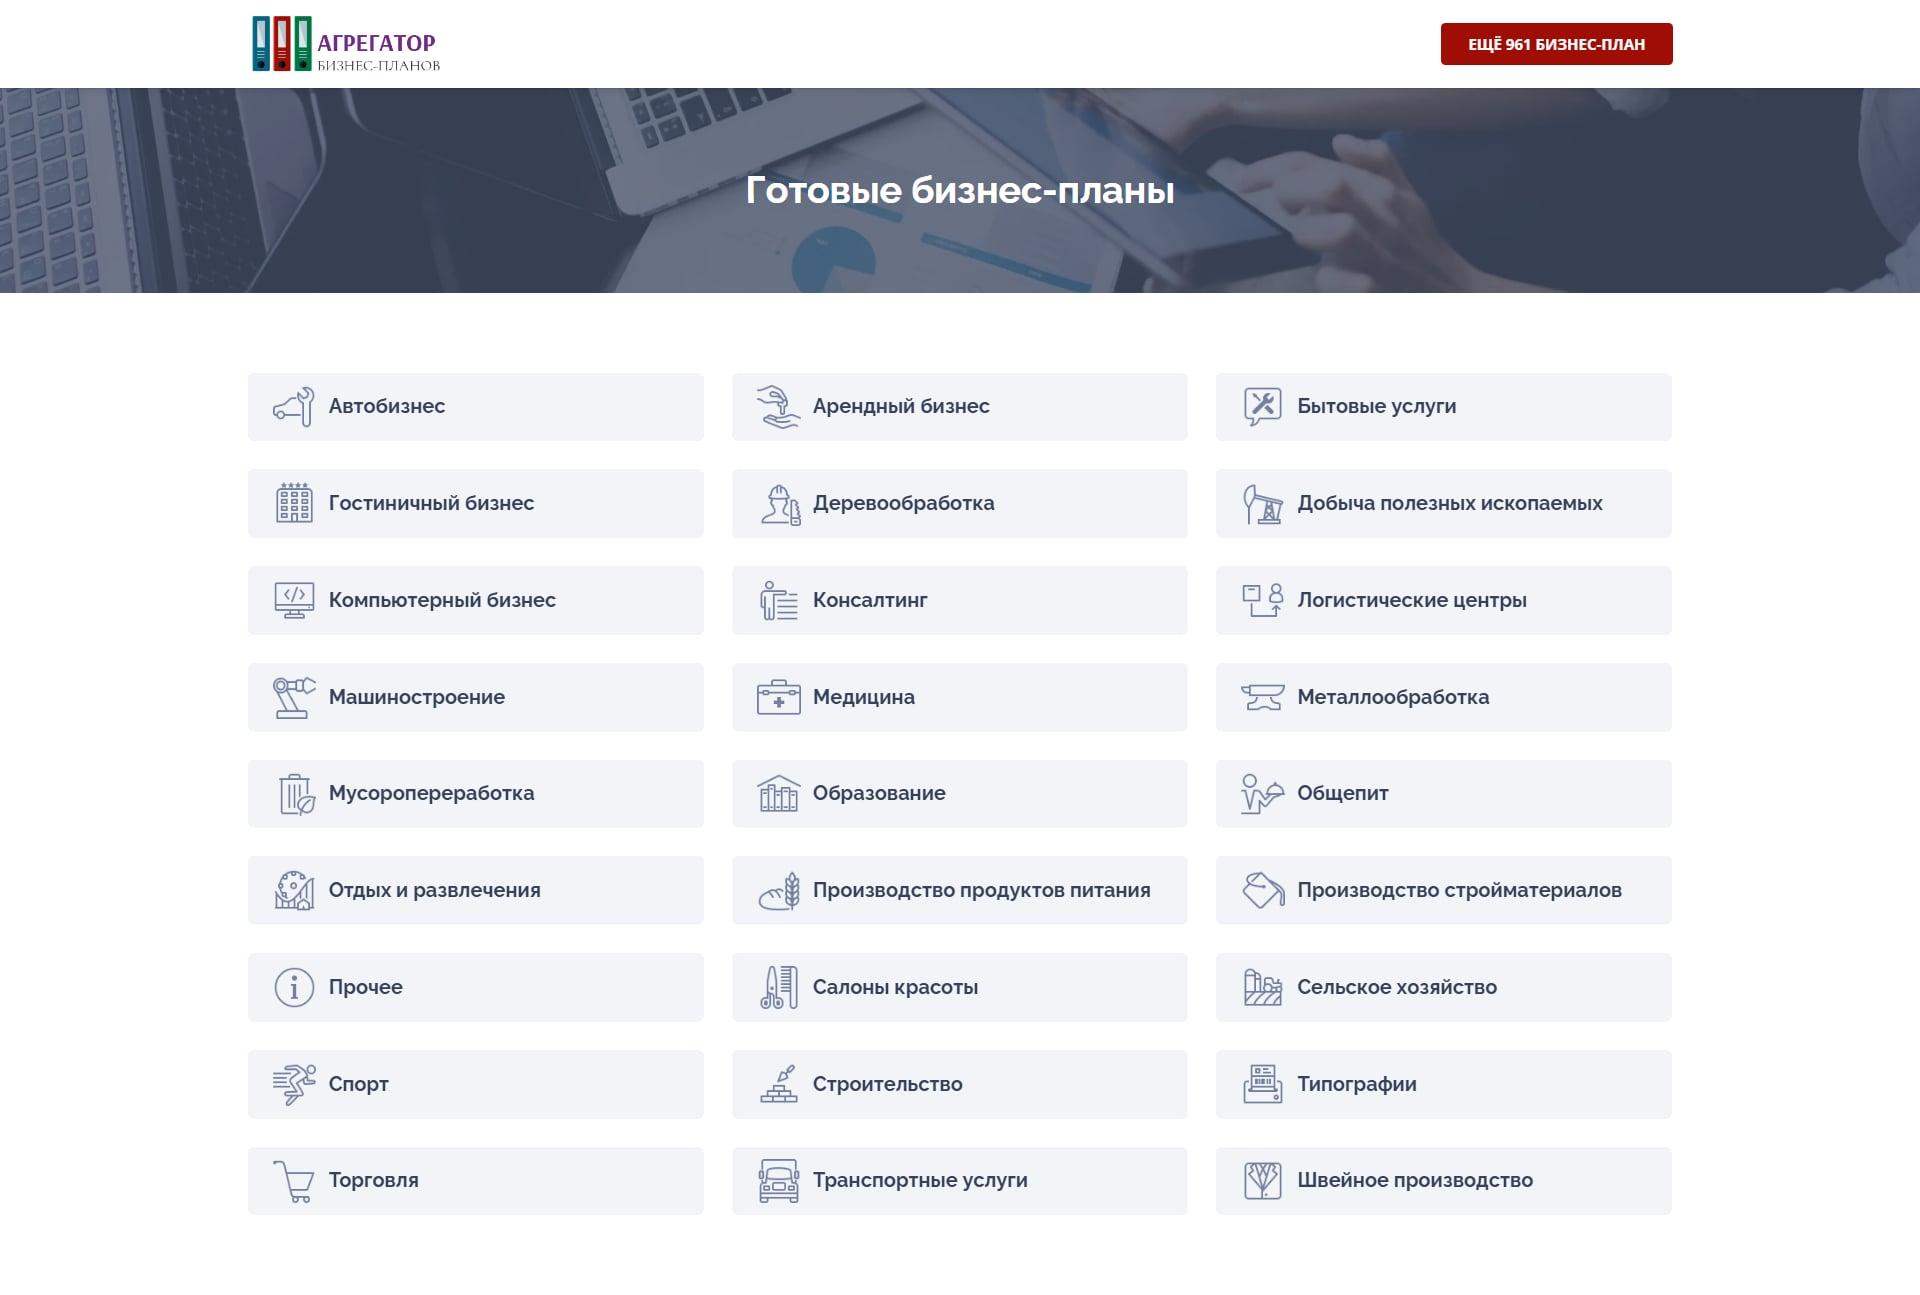 Сайт-визитка по бизнес планам